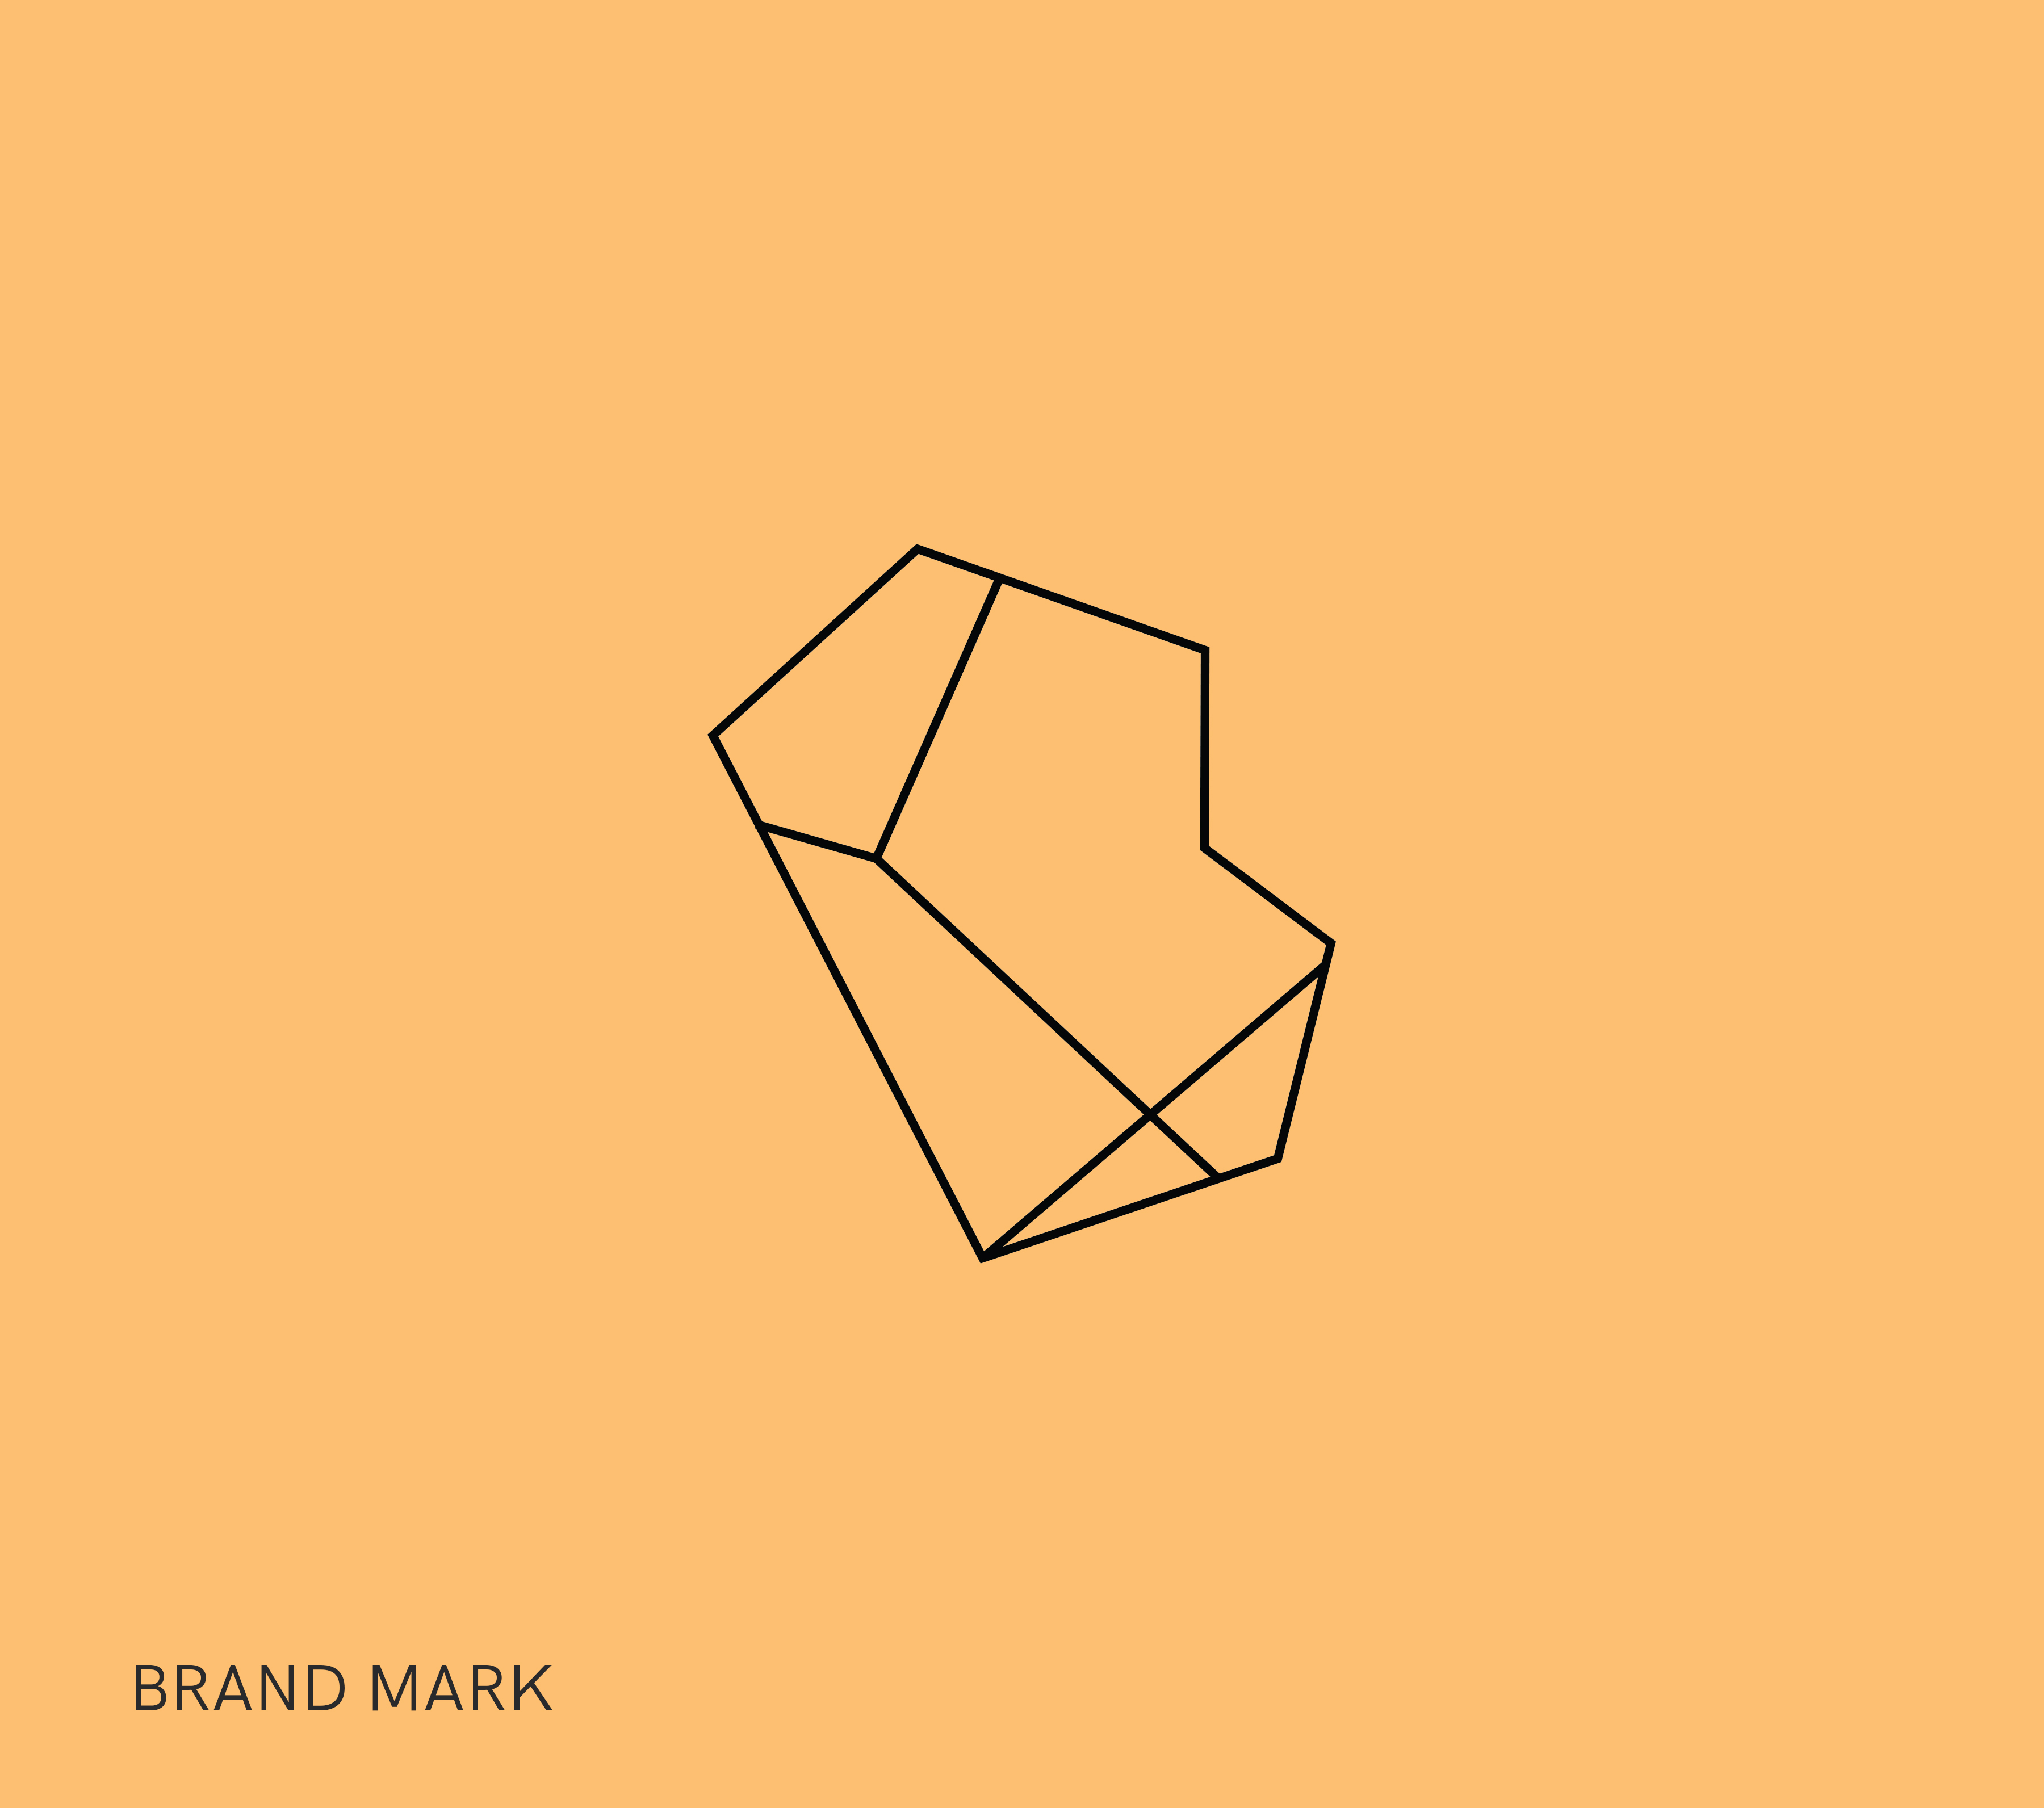 b_brand_mark